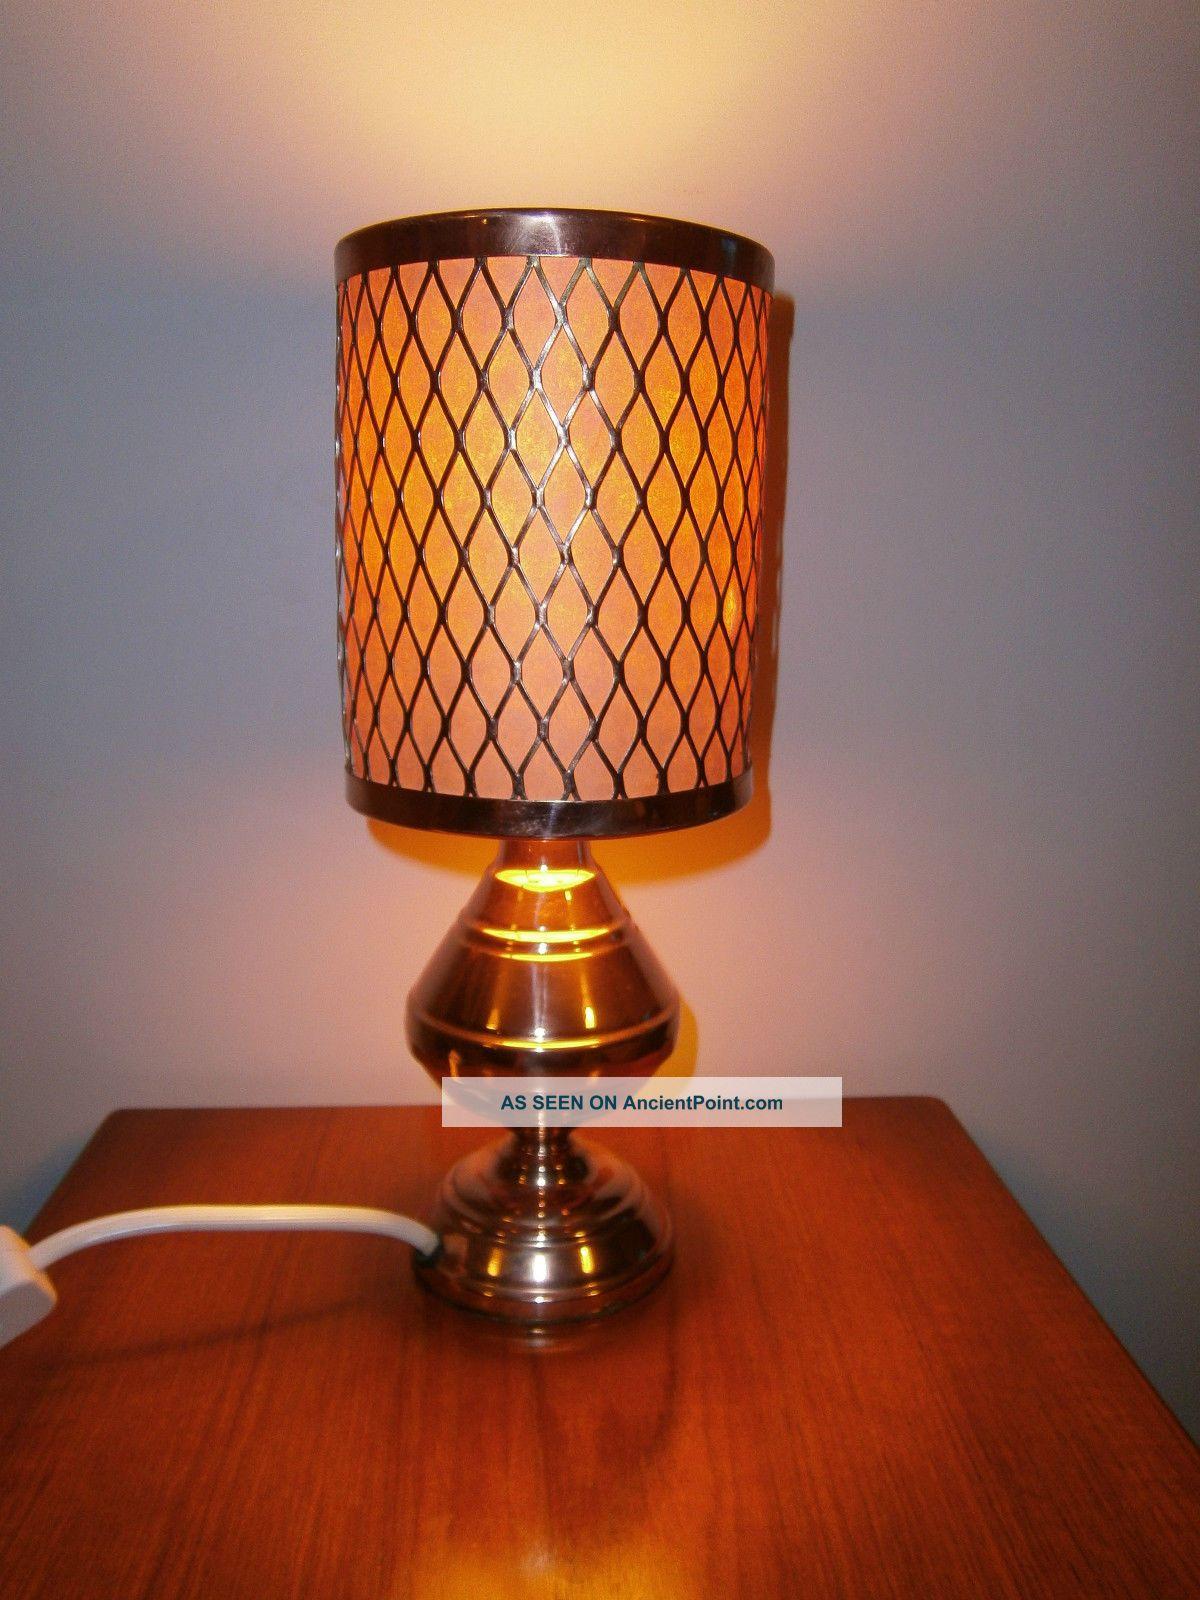 Vintage Copper Lamp - 70s Retro - P&p 20th Century photo